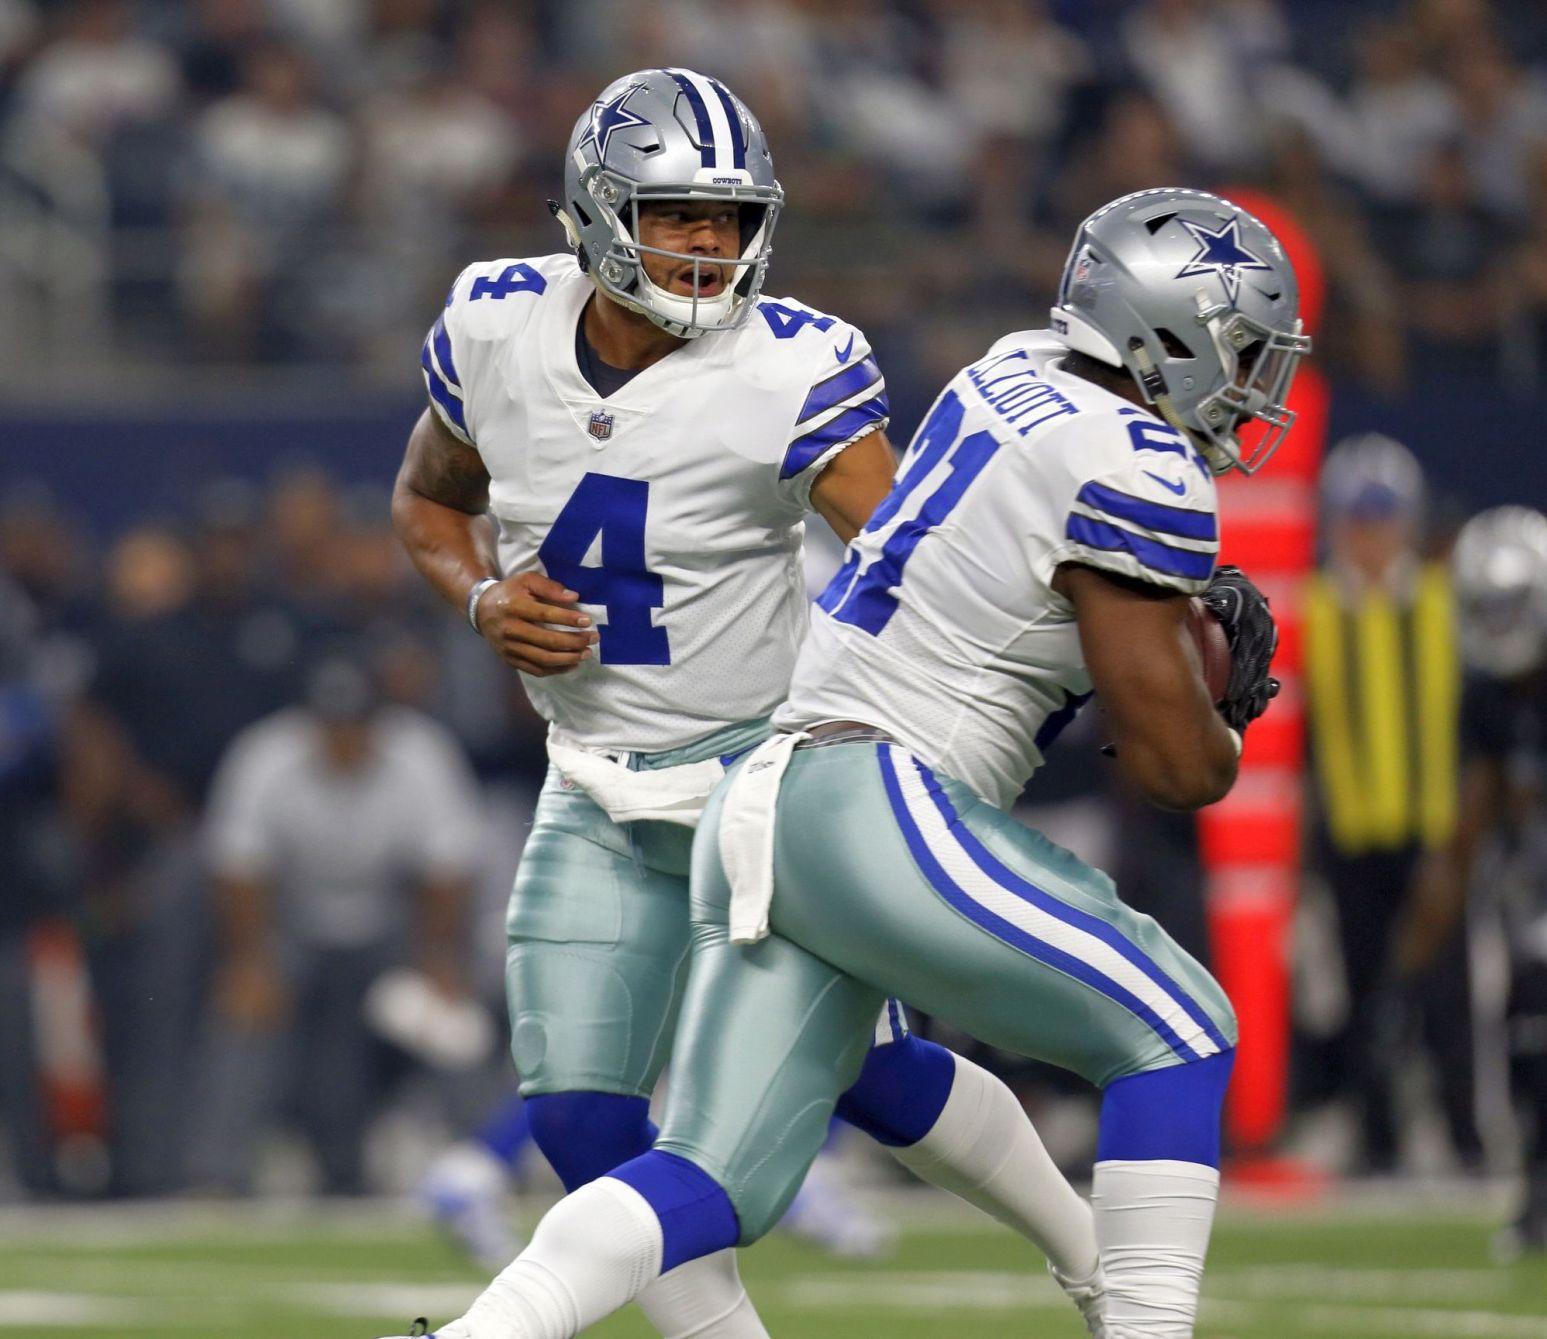 Bruce Arians on blueprint for beating Cowboys: 'Borrow Denver's players'